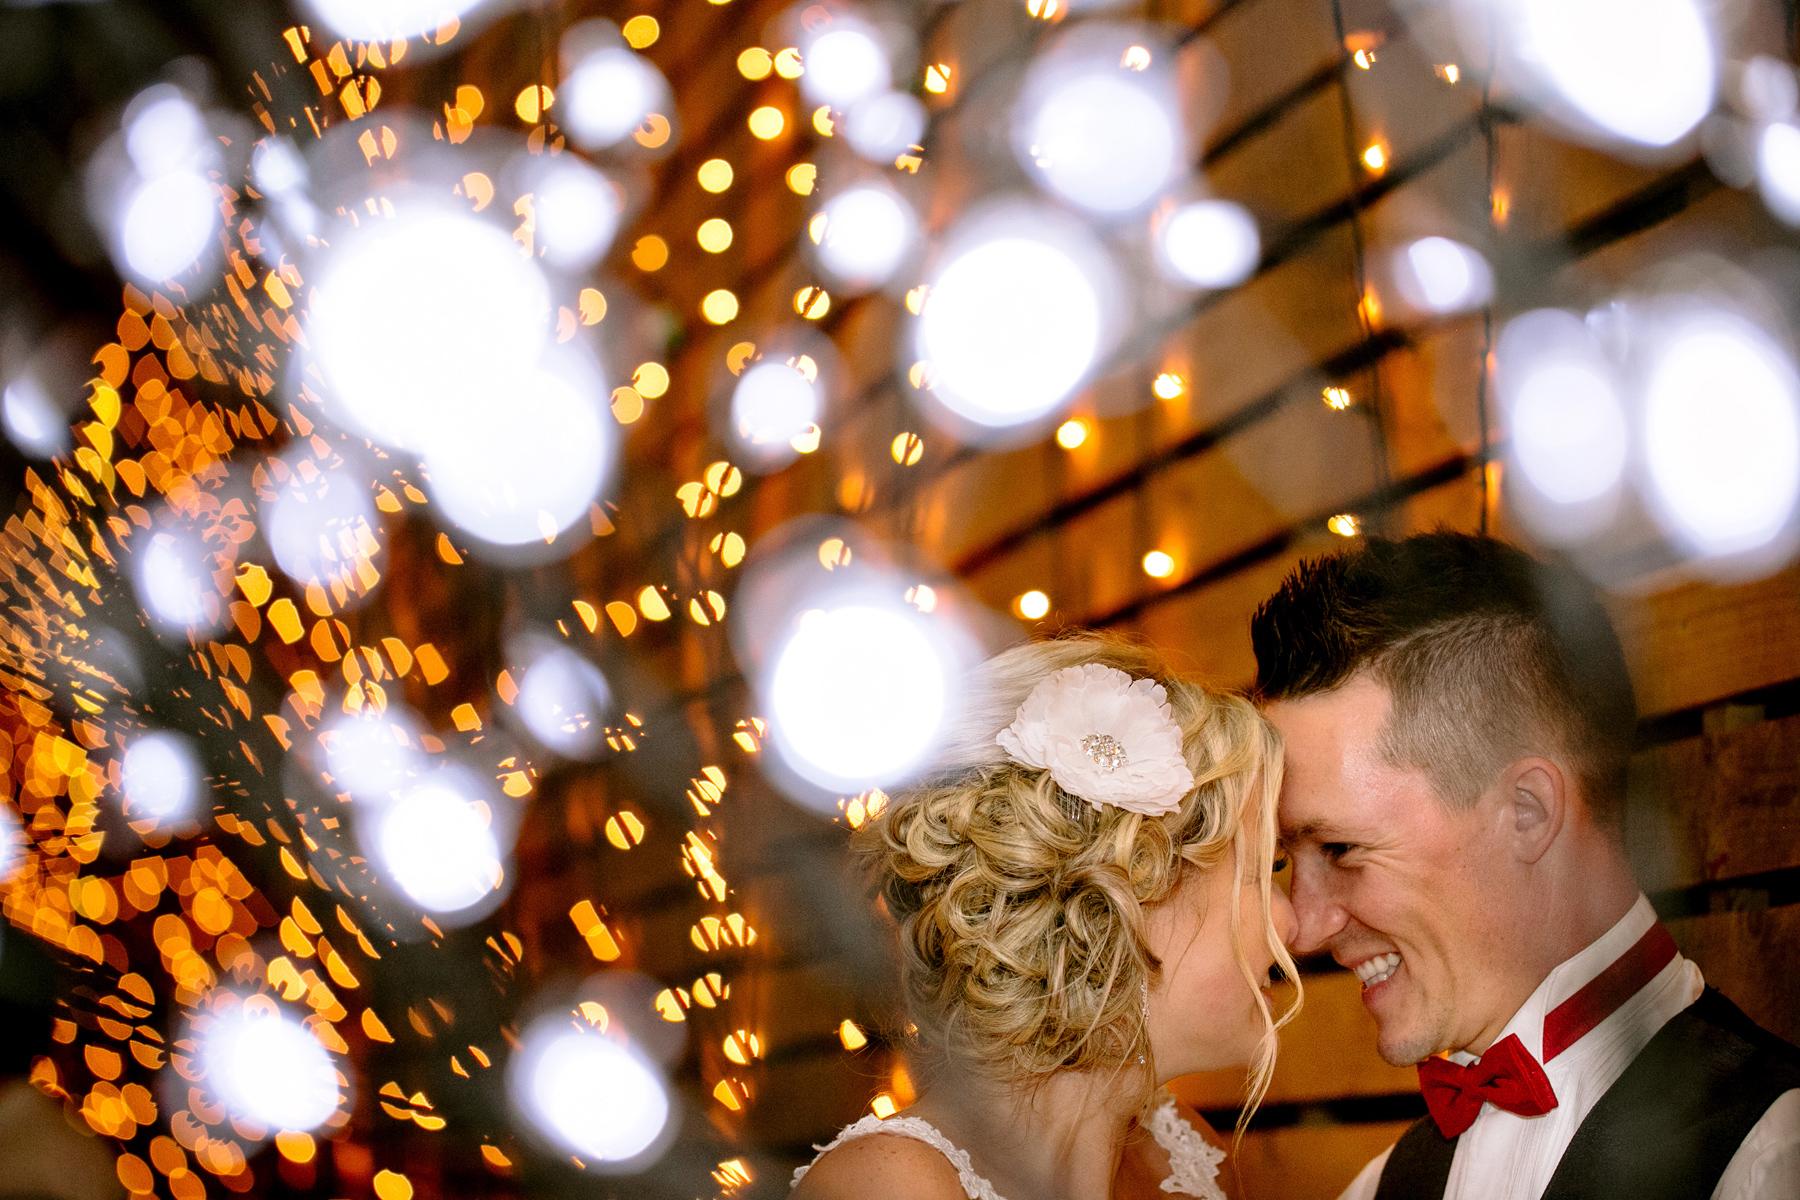 077-awesome-pei-wedding-photography-kandisebrown-jg2016